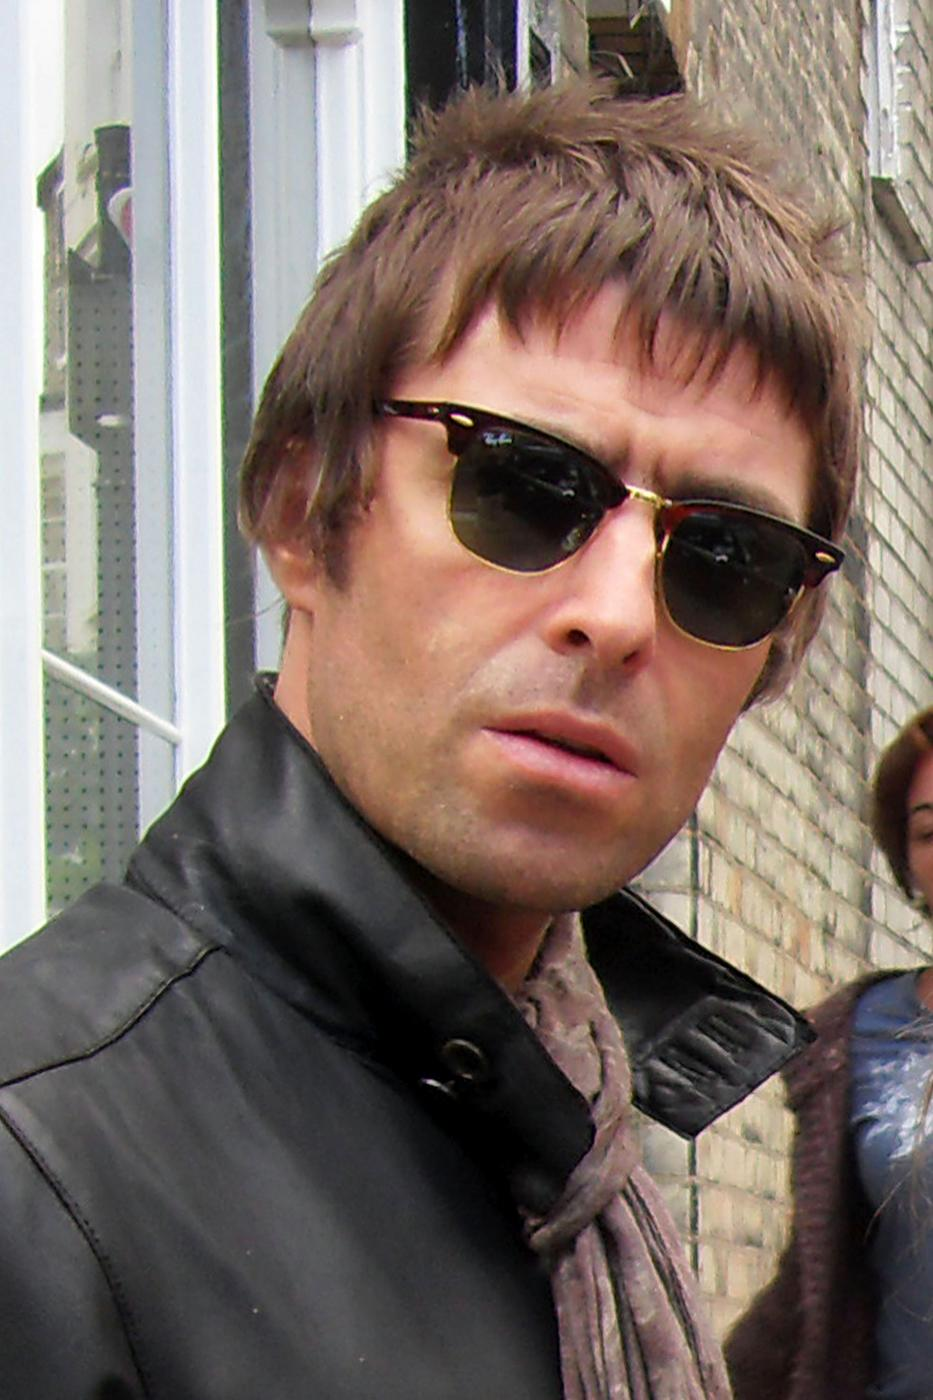 Ray Ban Caravan Noel Gallagher